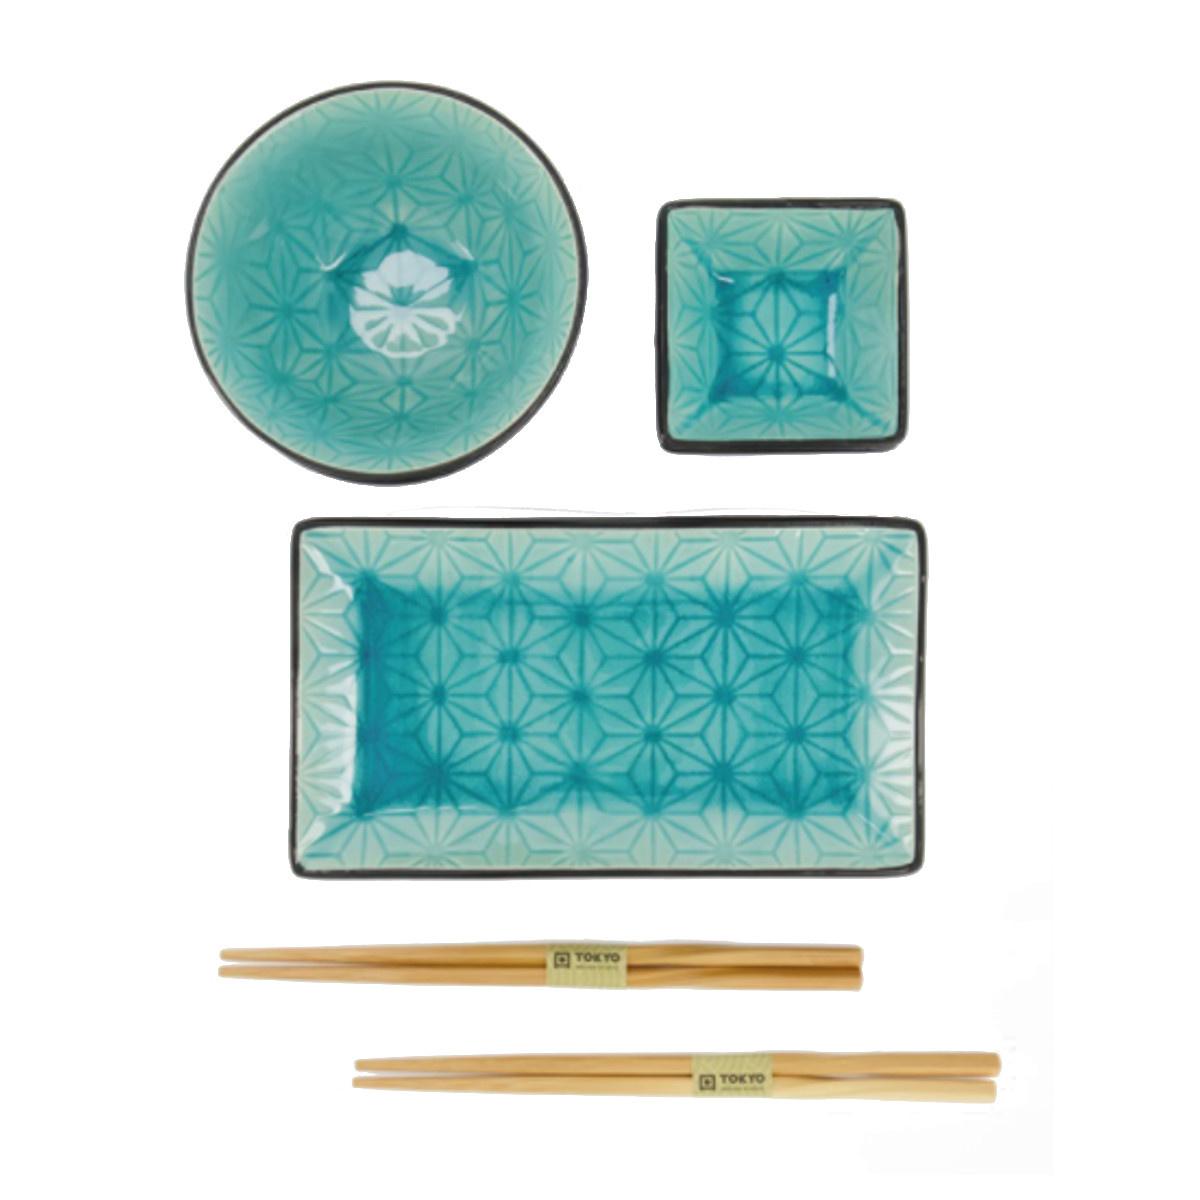 Tokyo Design Studio Coffret Service à Sushi Glassy Turquoise Star de Tokyo Design Studio – 8-pièces